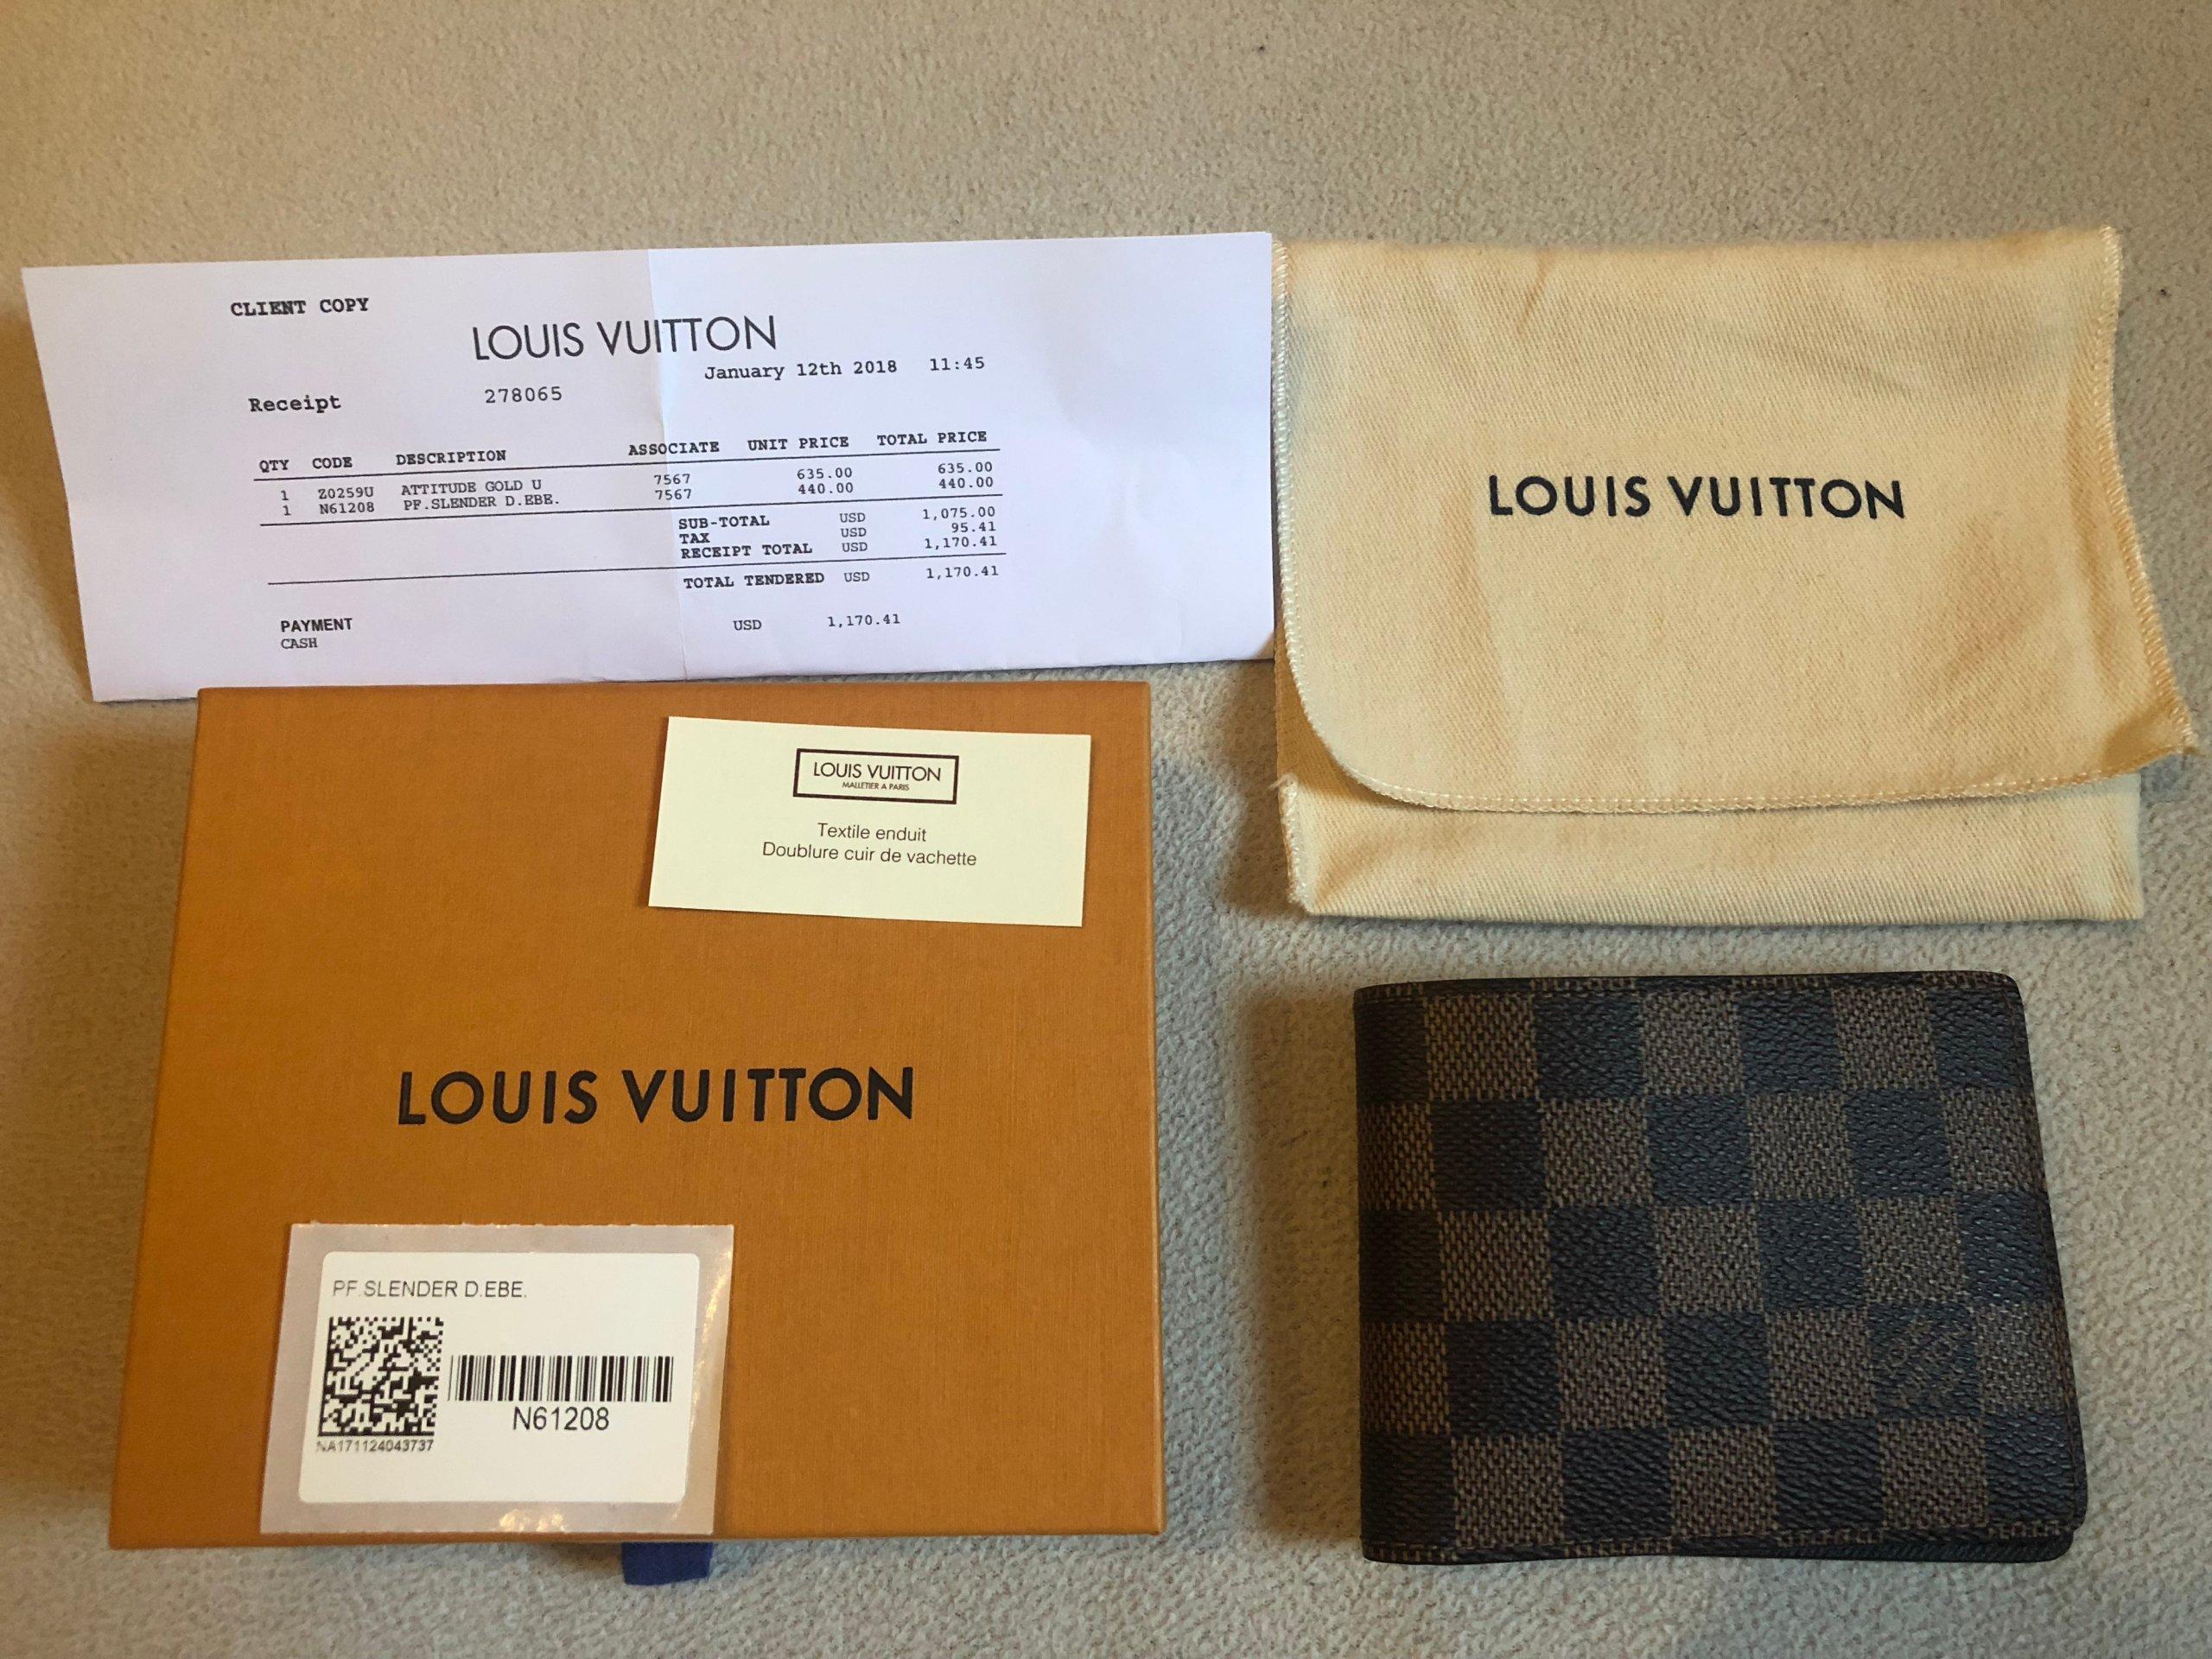 7cb3121a9280c Nowy Oryginalny Portfel Louis Vuitton Monogram - 7484979618 ...